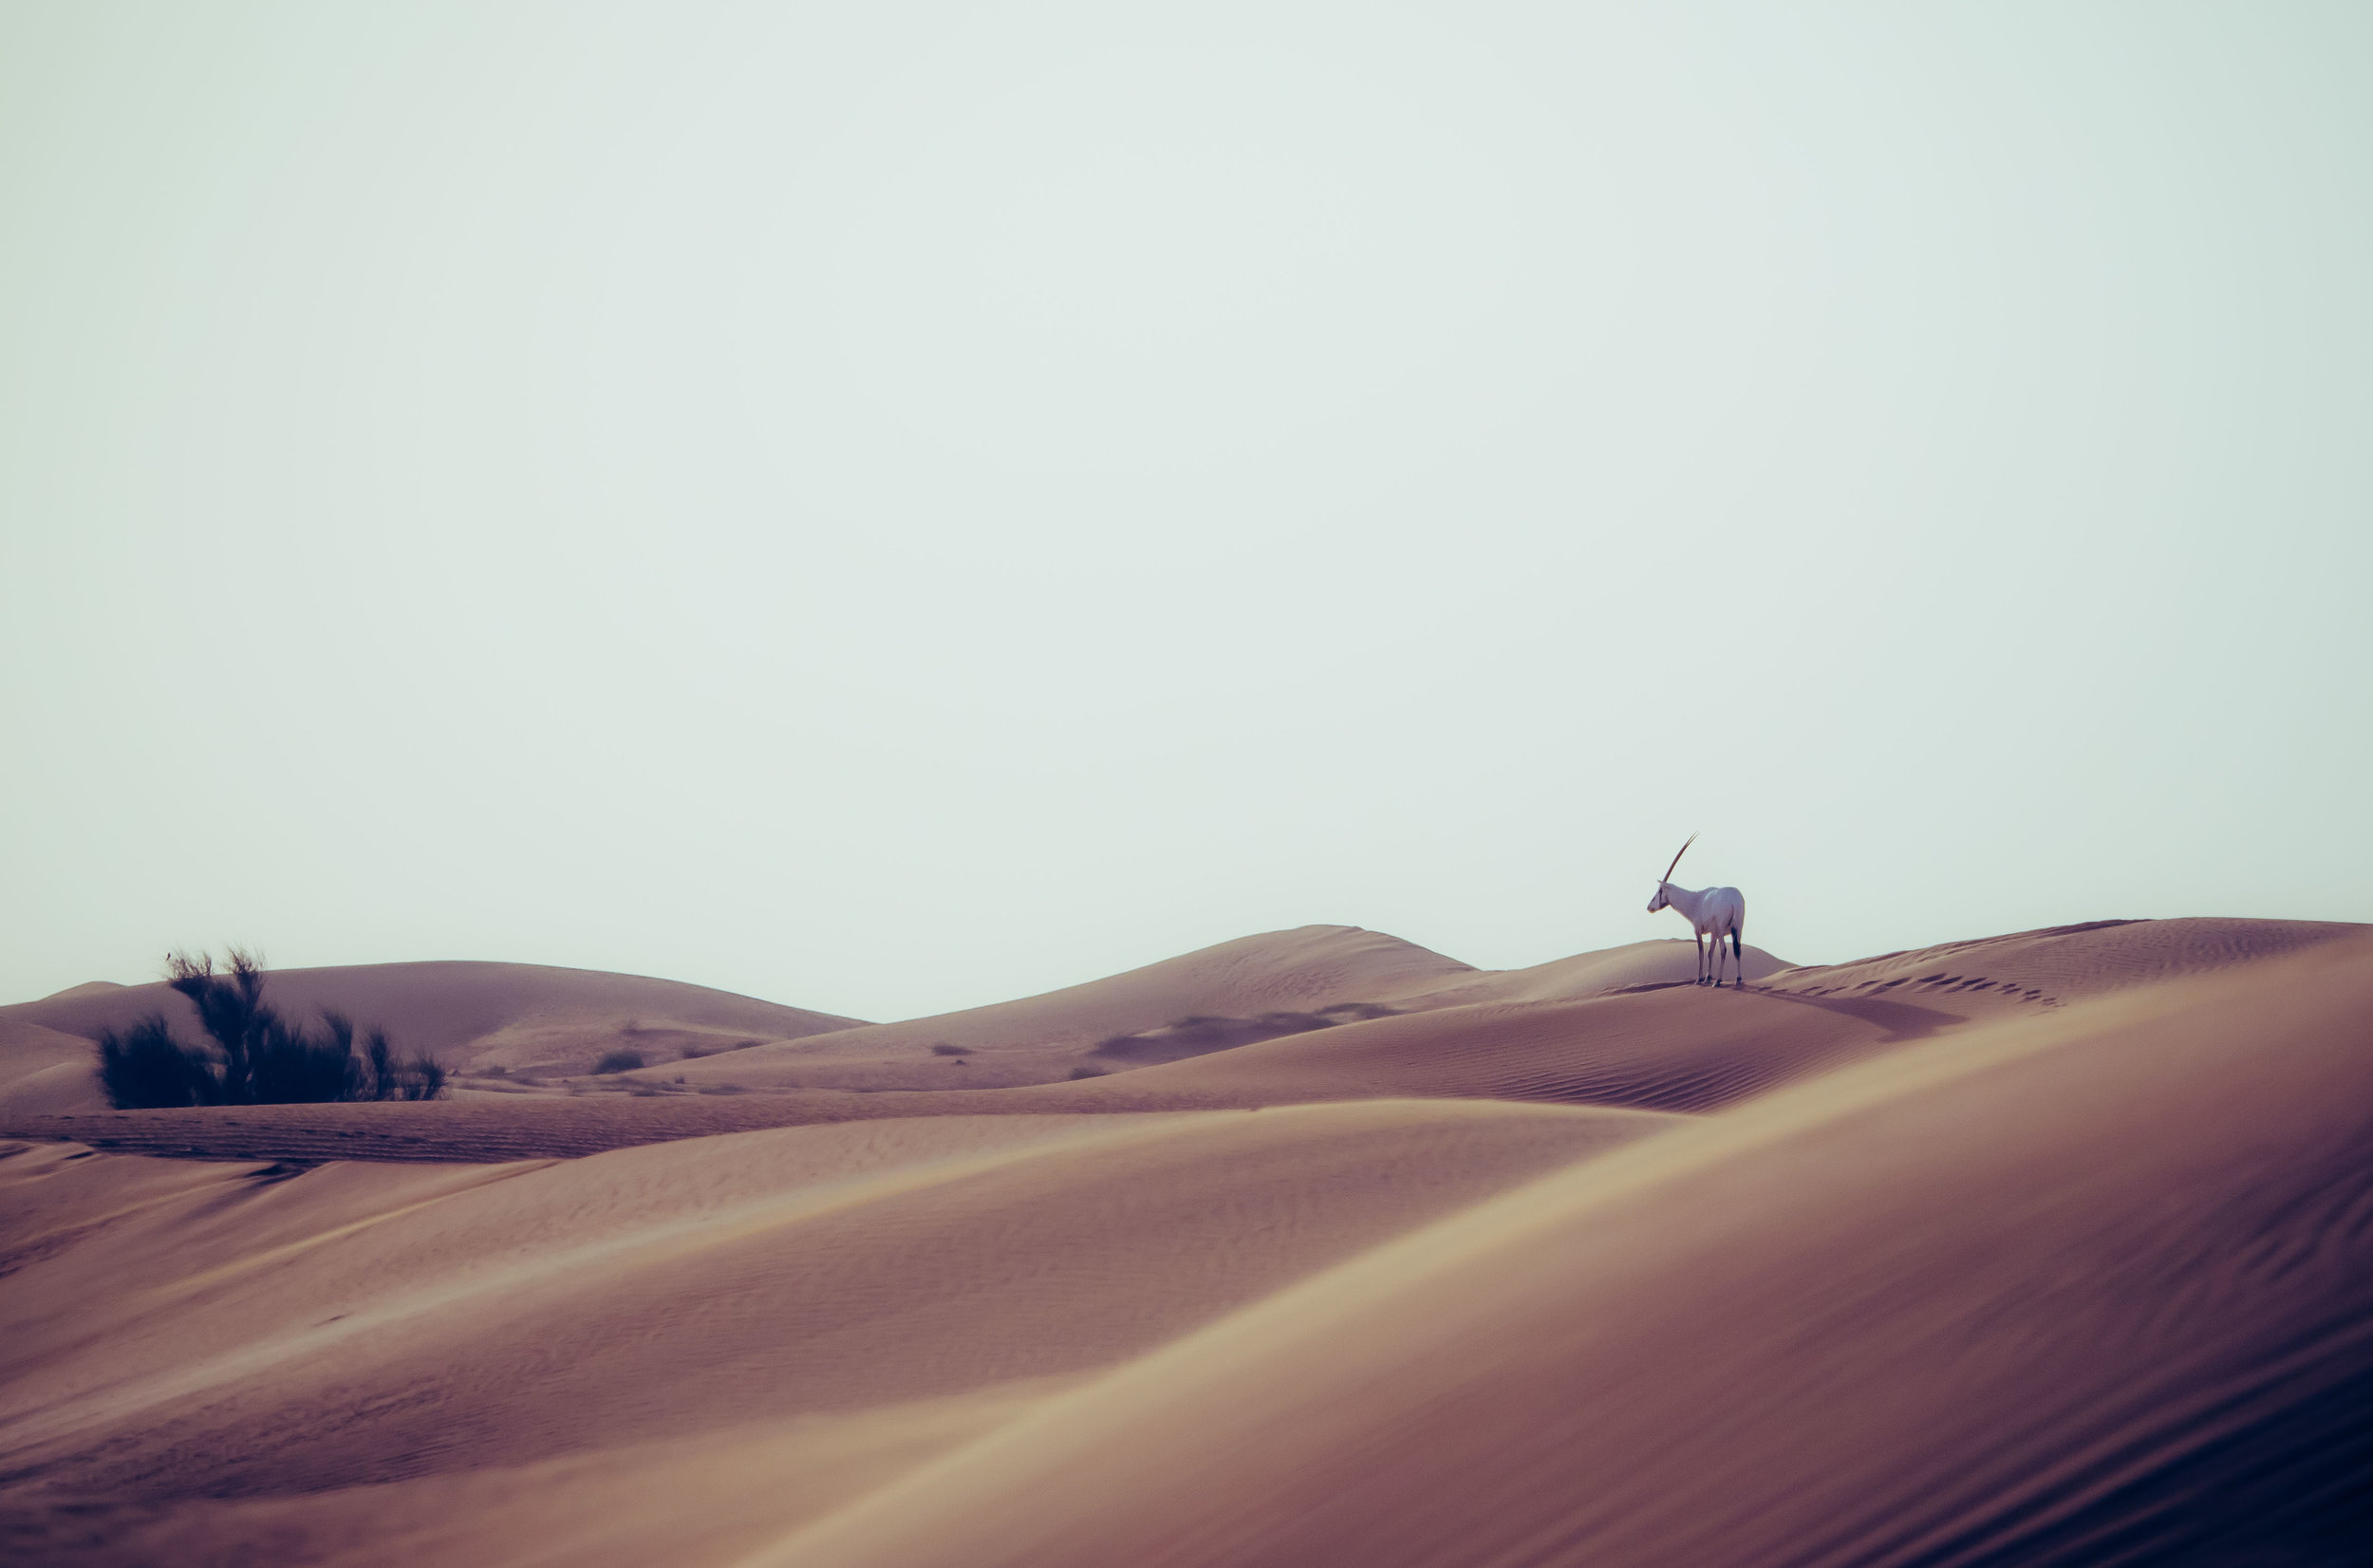 Oryx Tracks